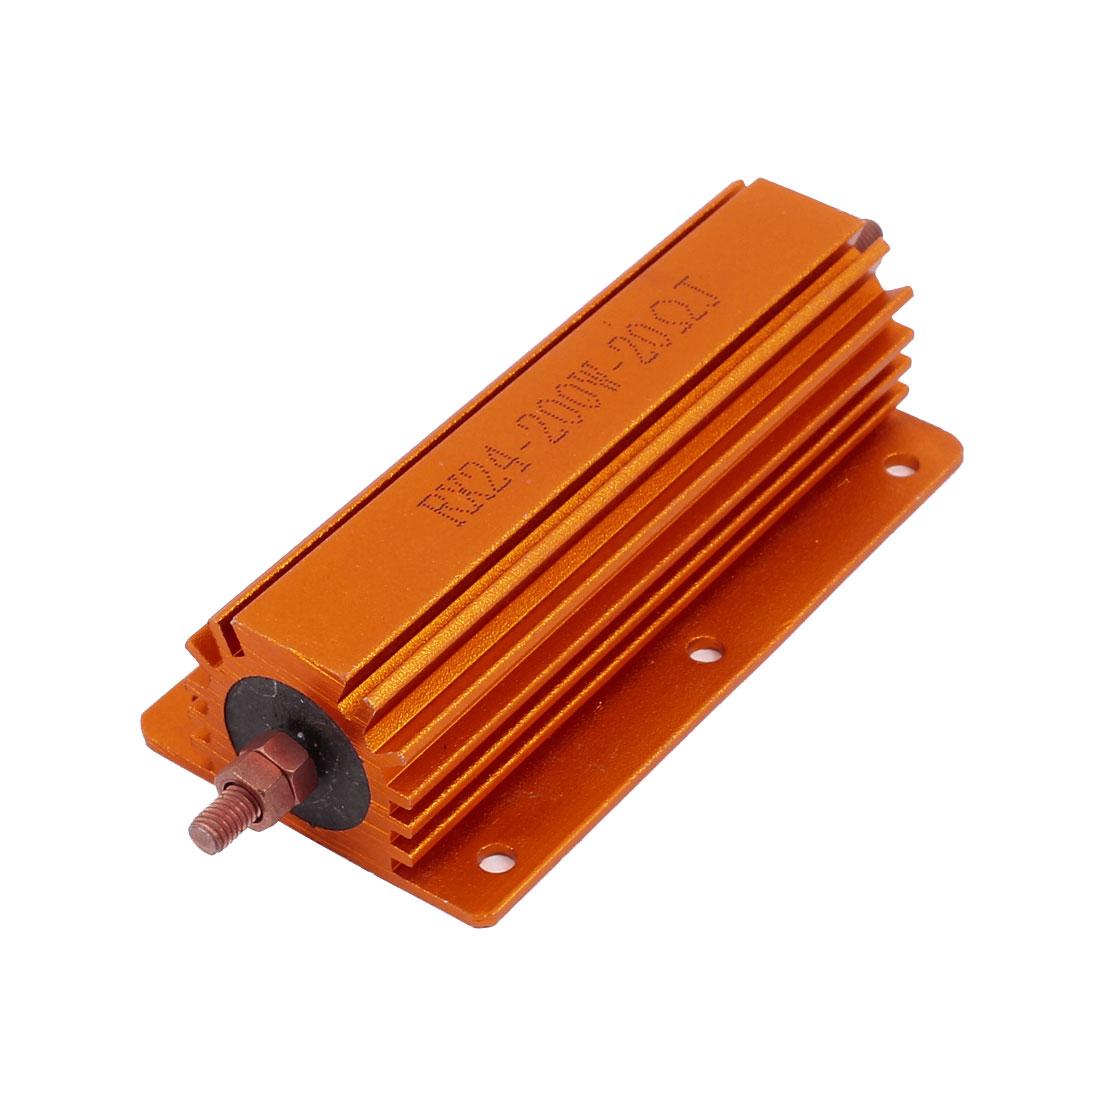 200W 20 Ohm Axial Lead Gold Tone Heatsink RX24 Aluminum Clad Resistor